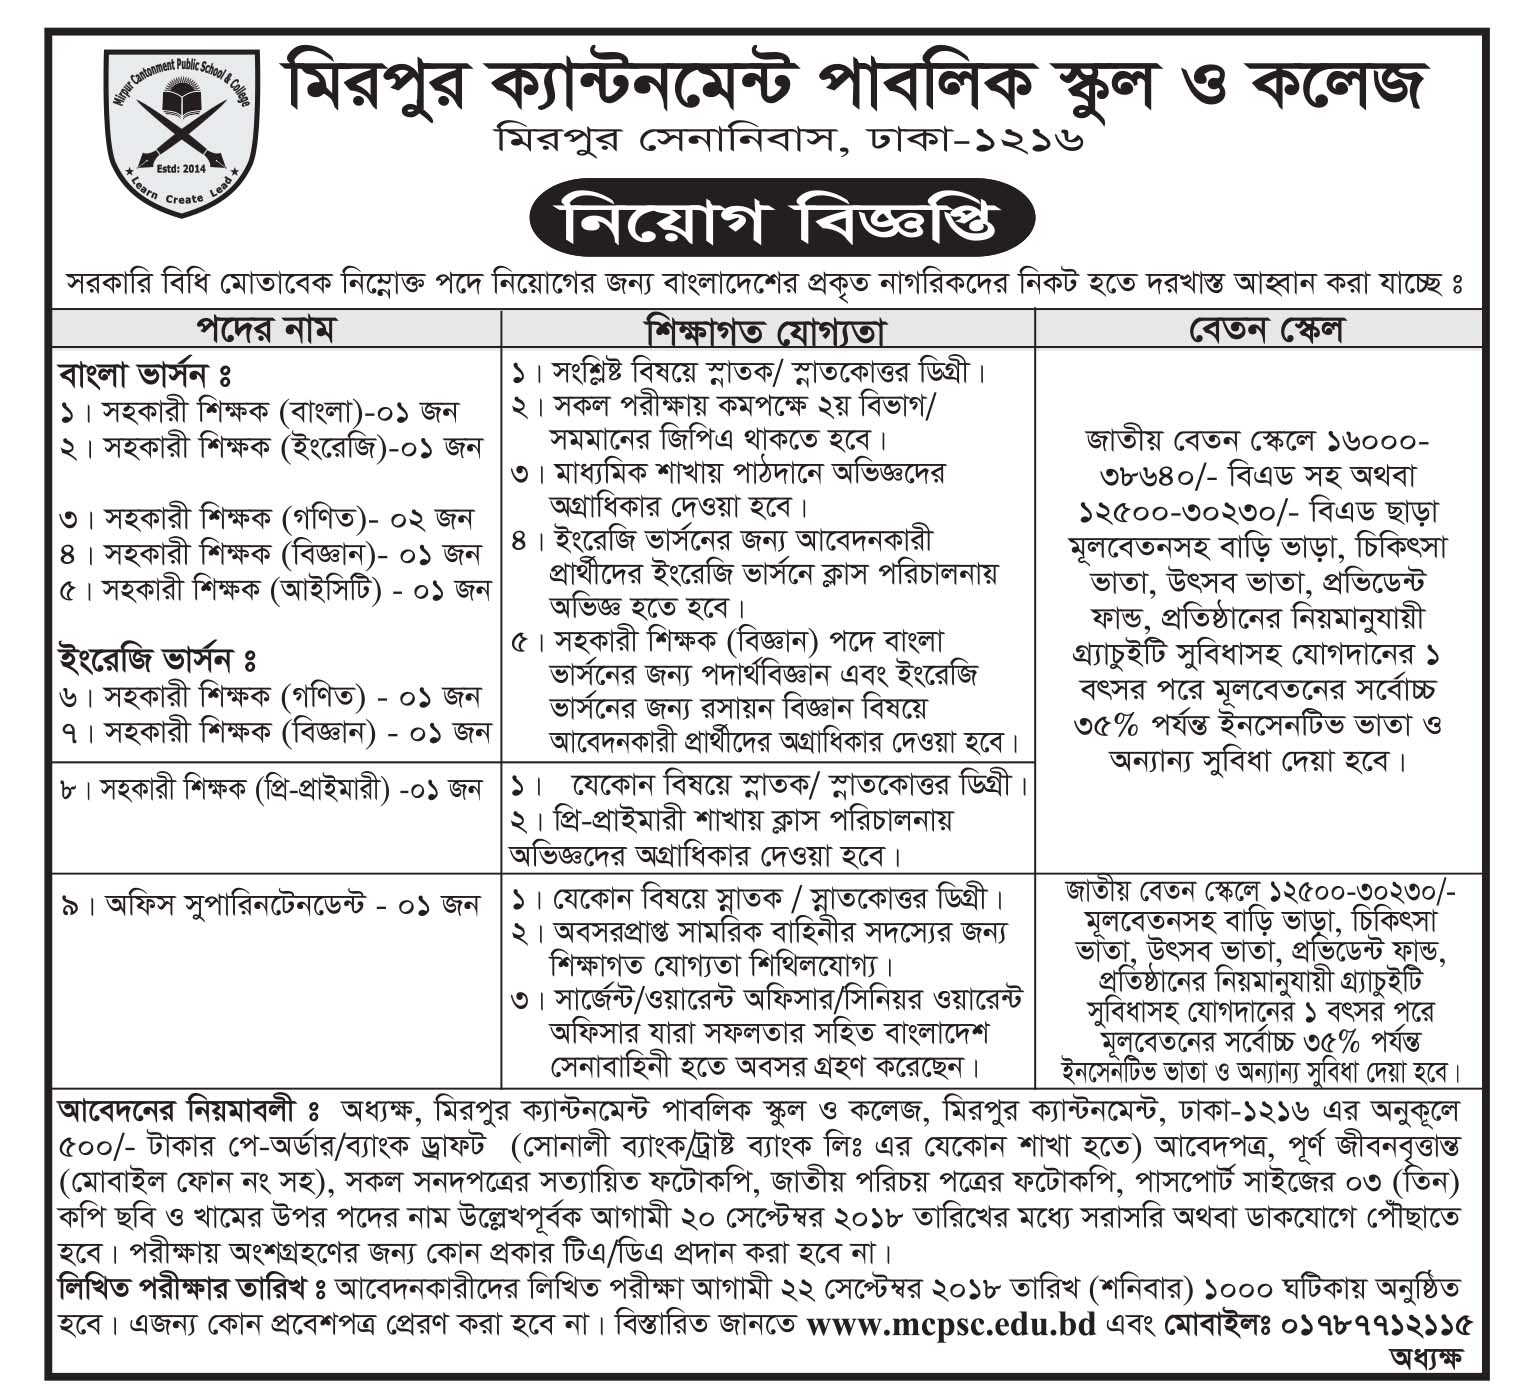 Mirpur Cantonment Public School & College Job Circular 2018